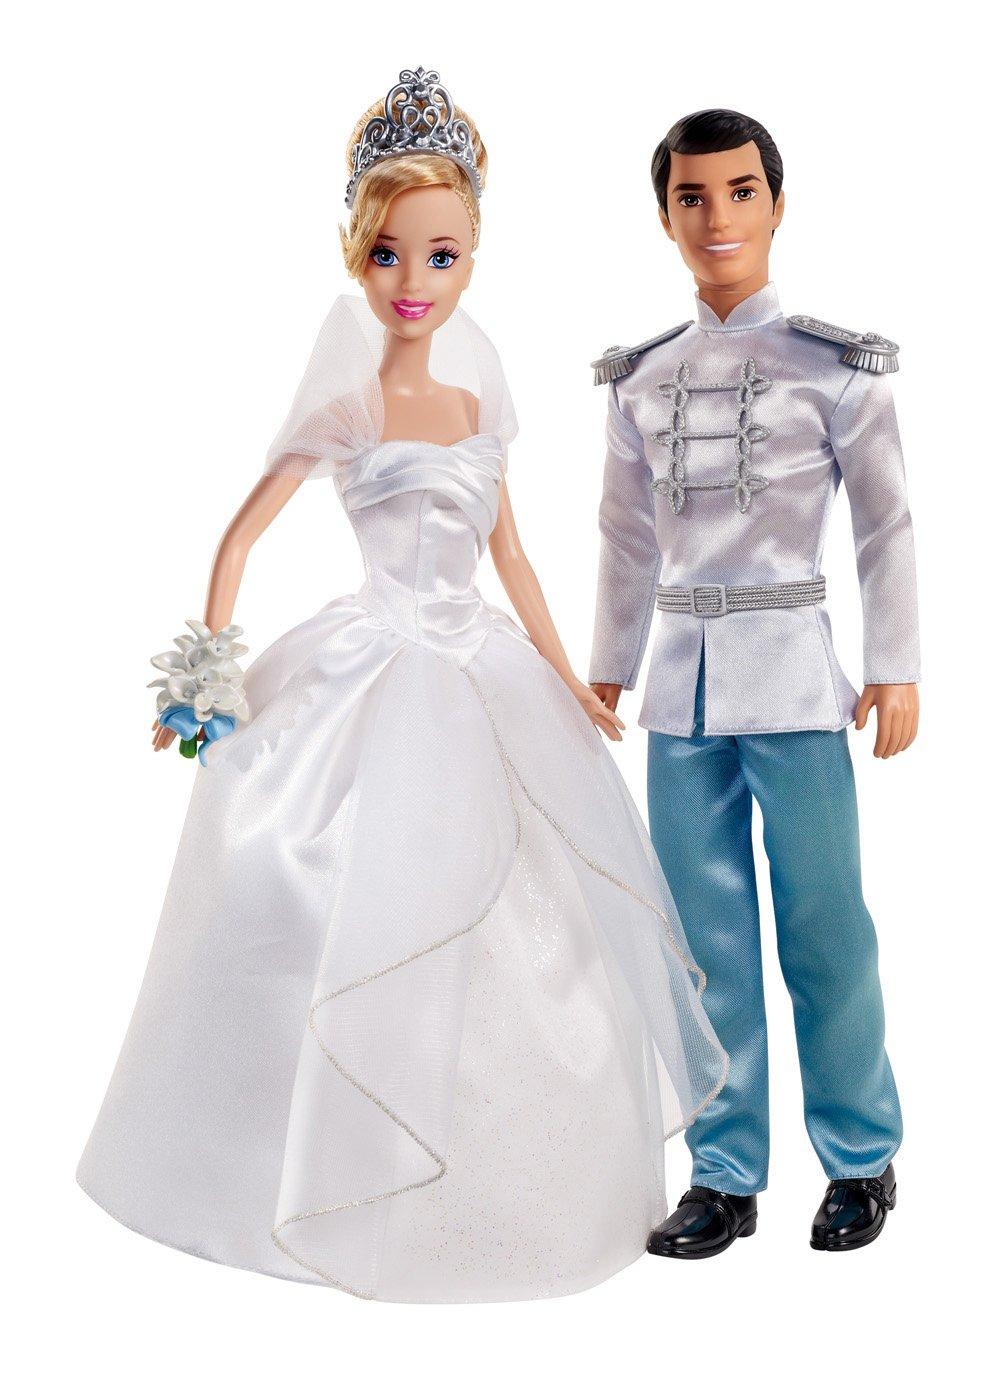 Amazon Disney Princess Cinderella Fairytale Wedding Giftset Toys Games